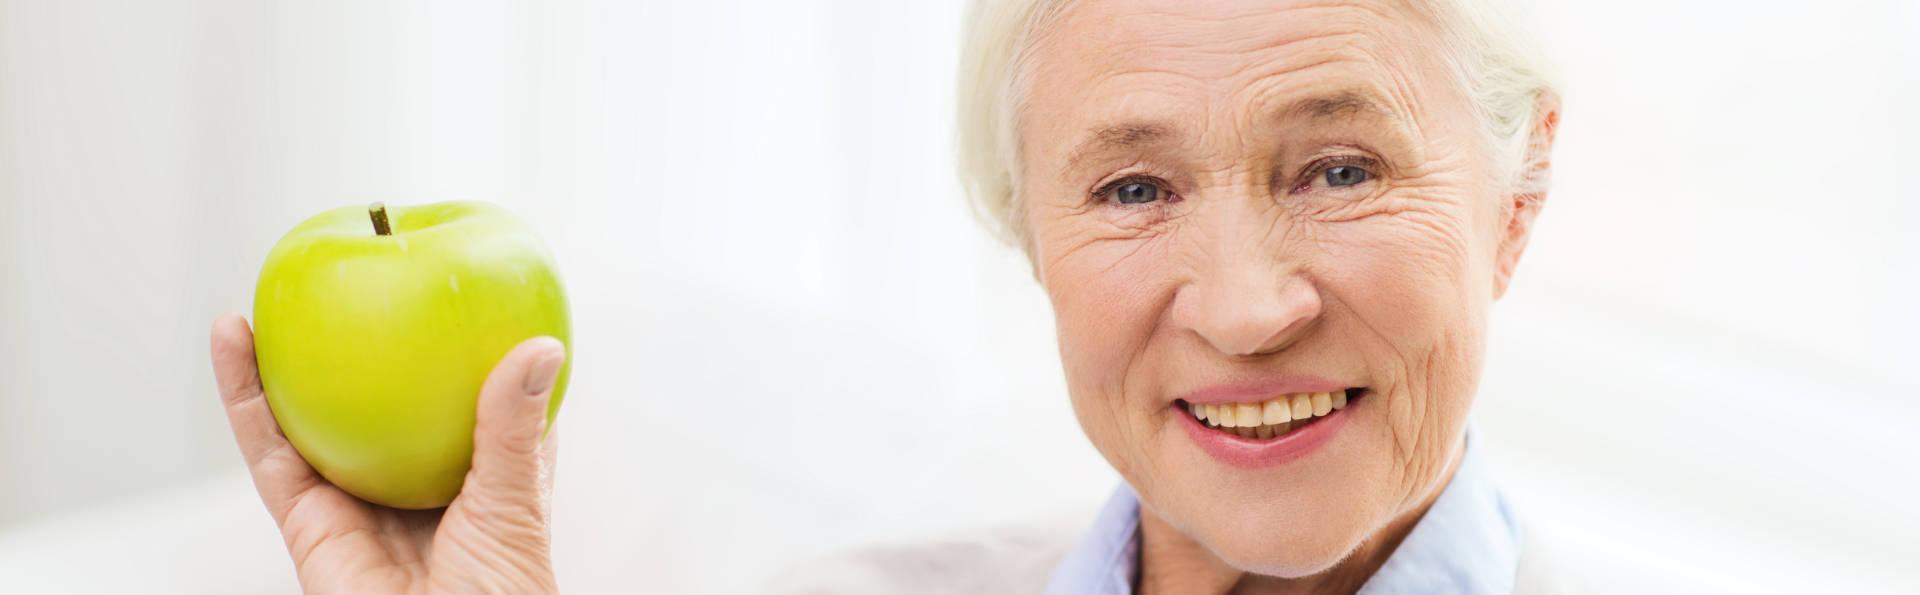 Elderly Patient After Receiving a Dental Crown from Jefferson Dental Care GA